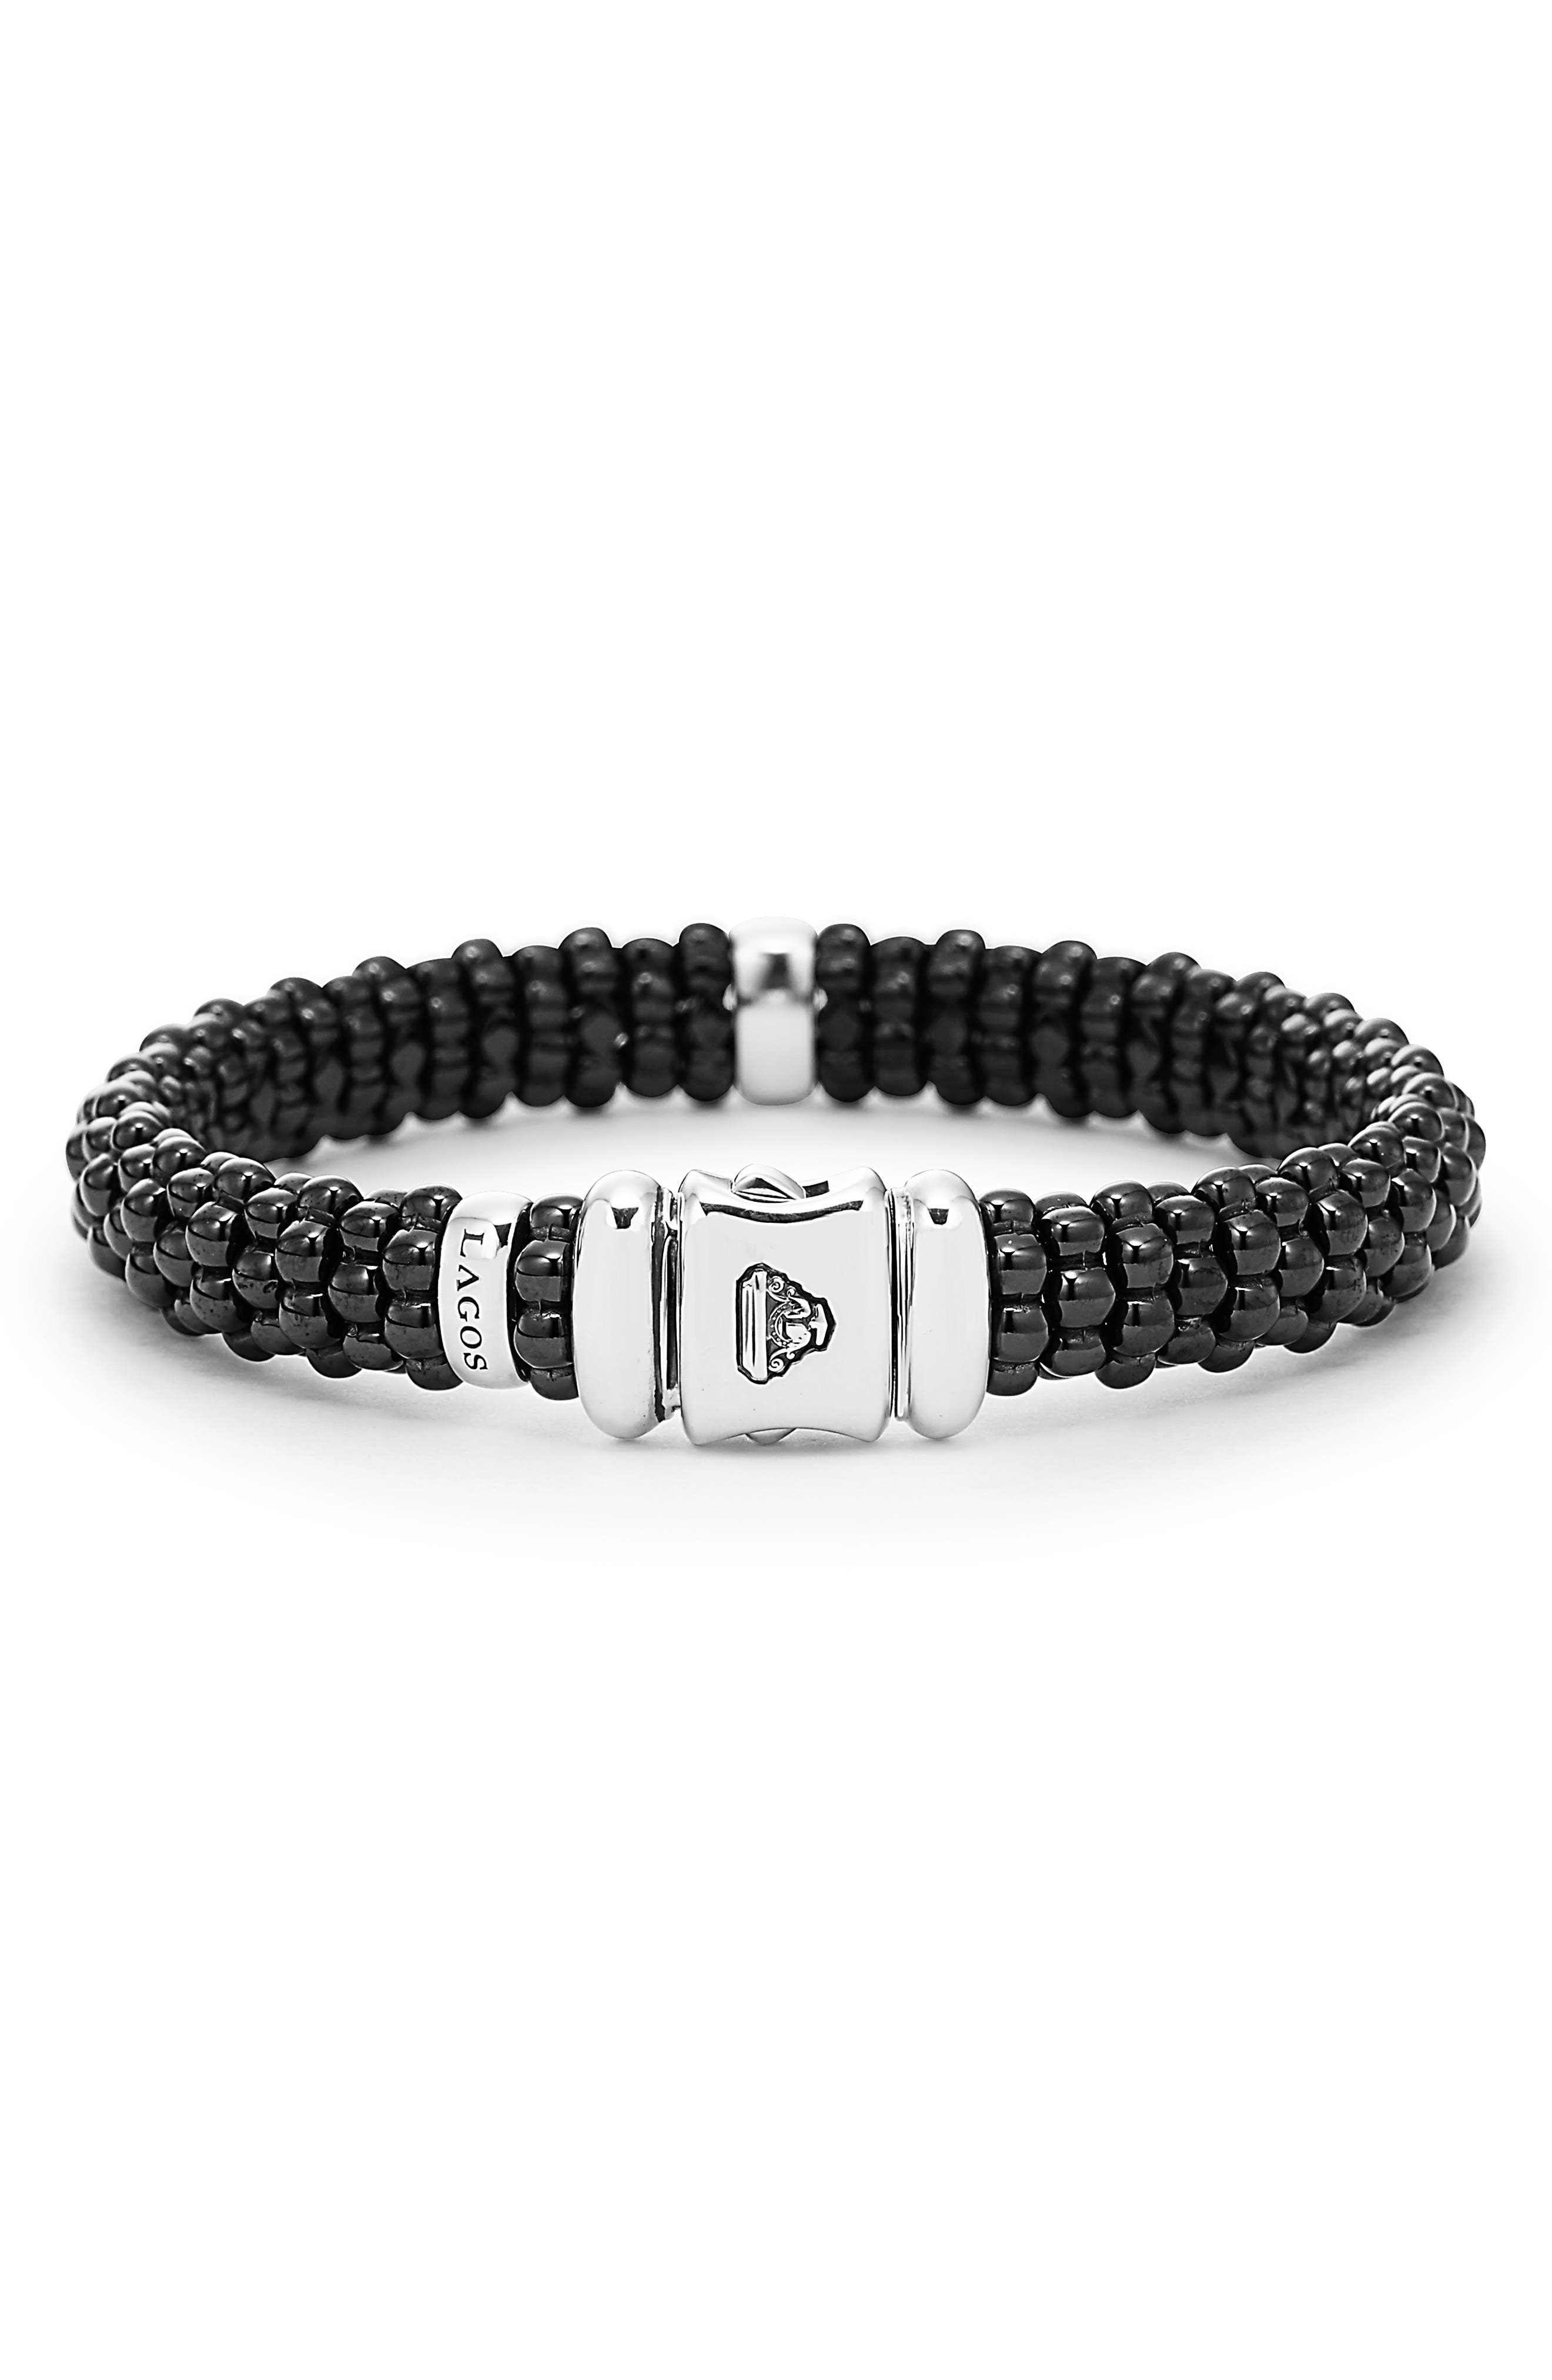 Black Caviar Bracelet,                             Alternate thumbnail 3, color,                             BLACK/ SILVER